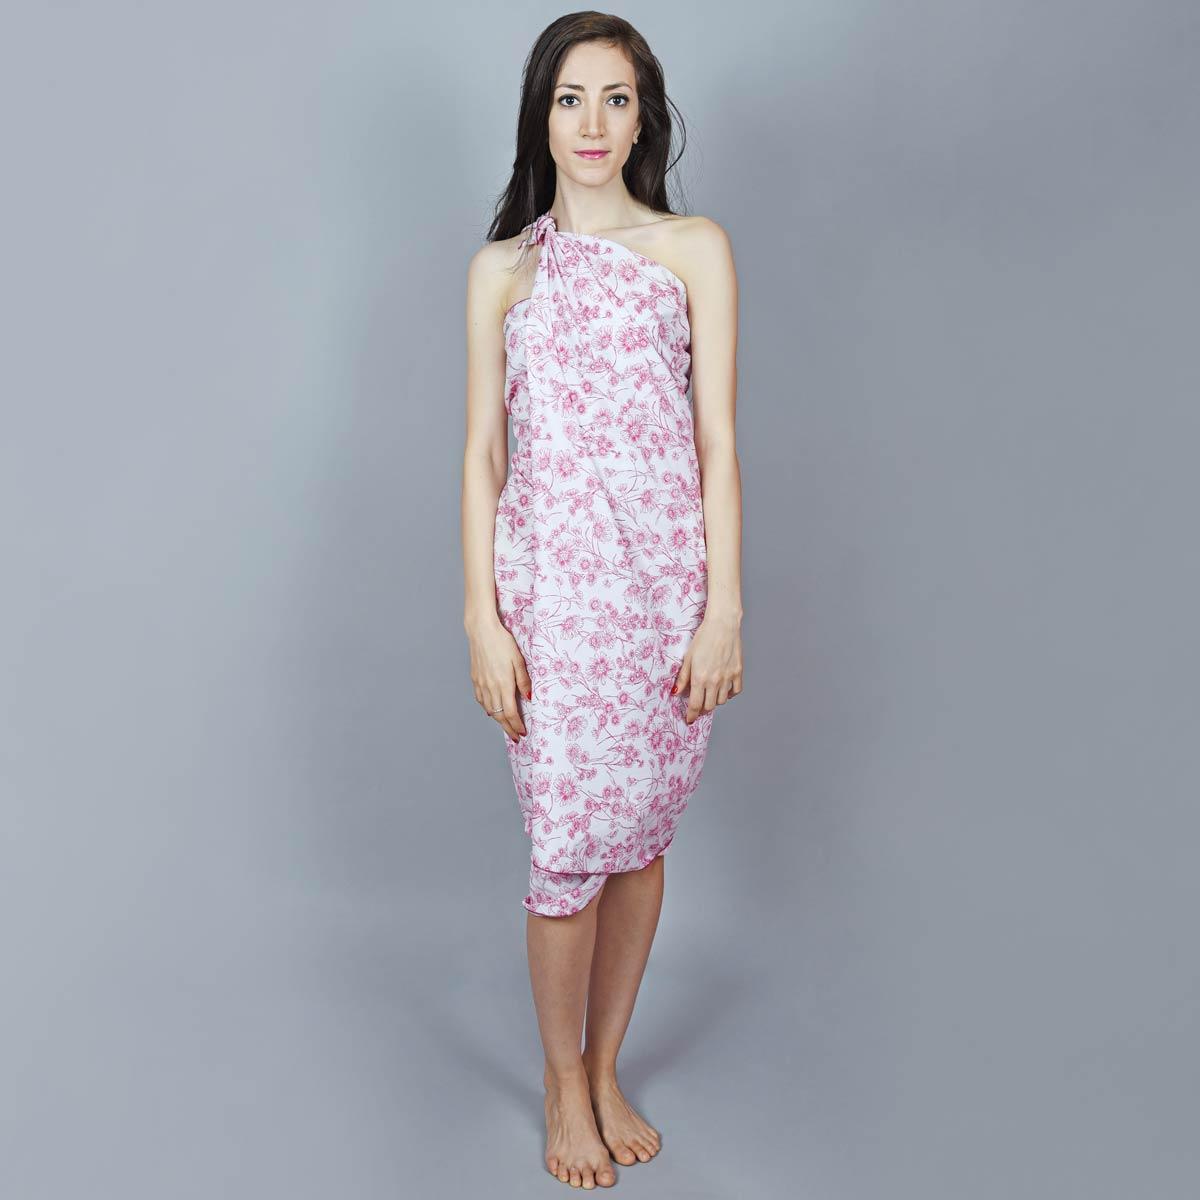 AT-05547_W12-2--_Pareo-femme-rose-fuchsia